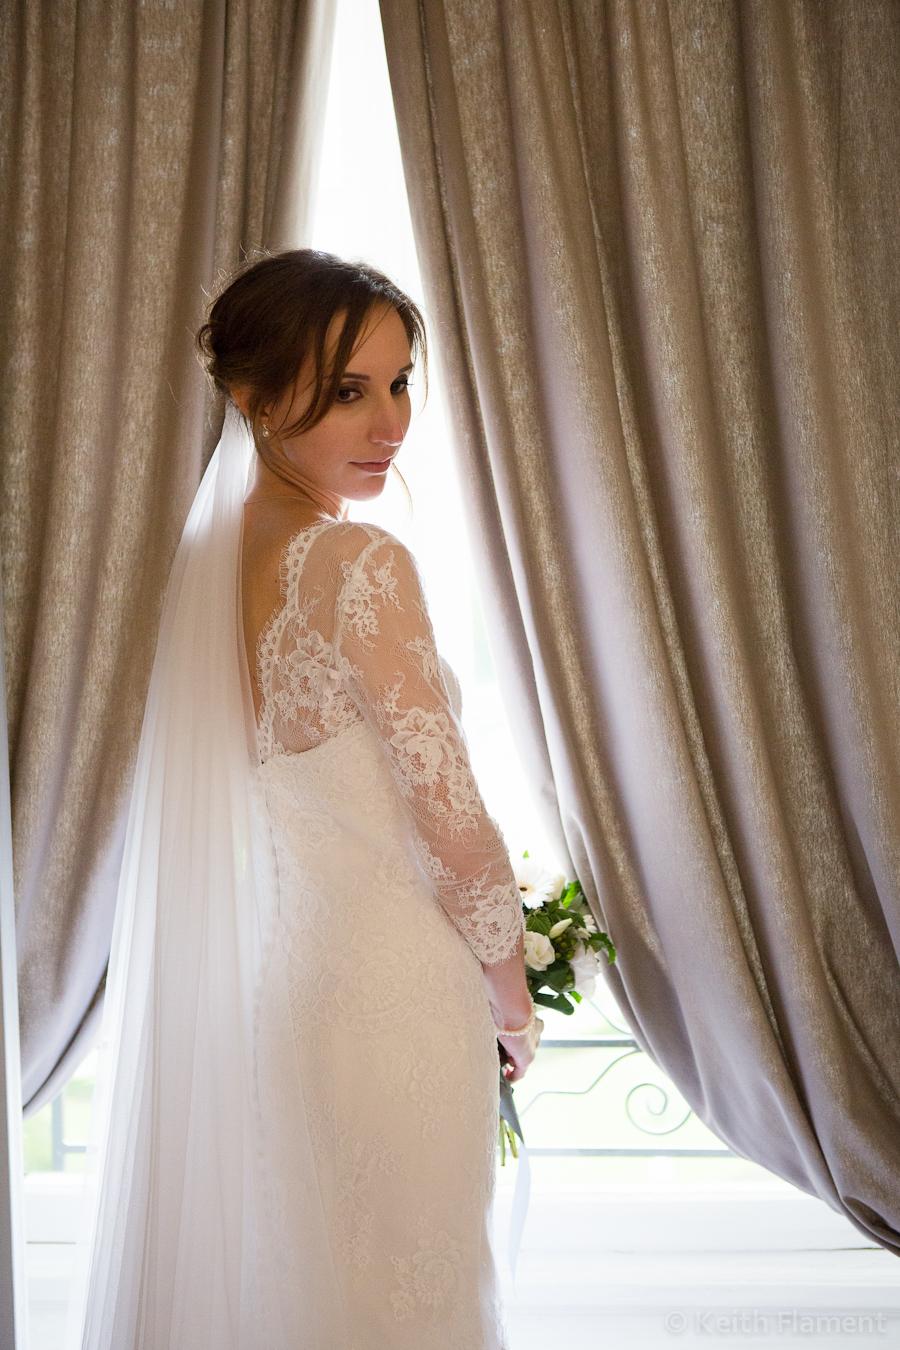 photographe-reportage-mariage-keith-flament-chateau-aveny-bourgogne-40